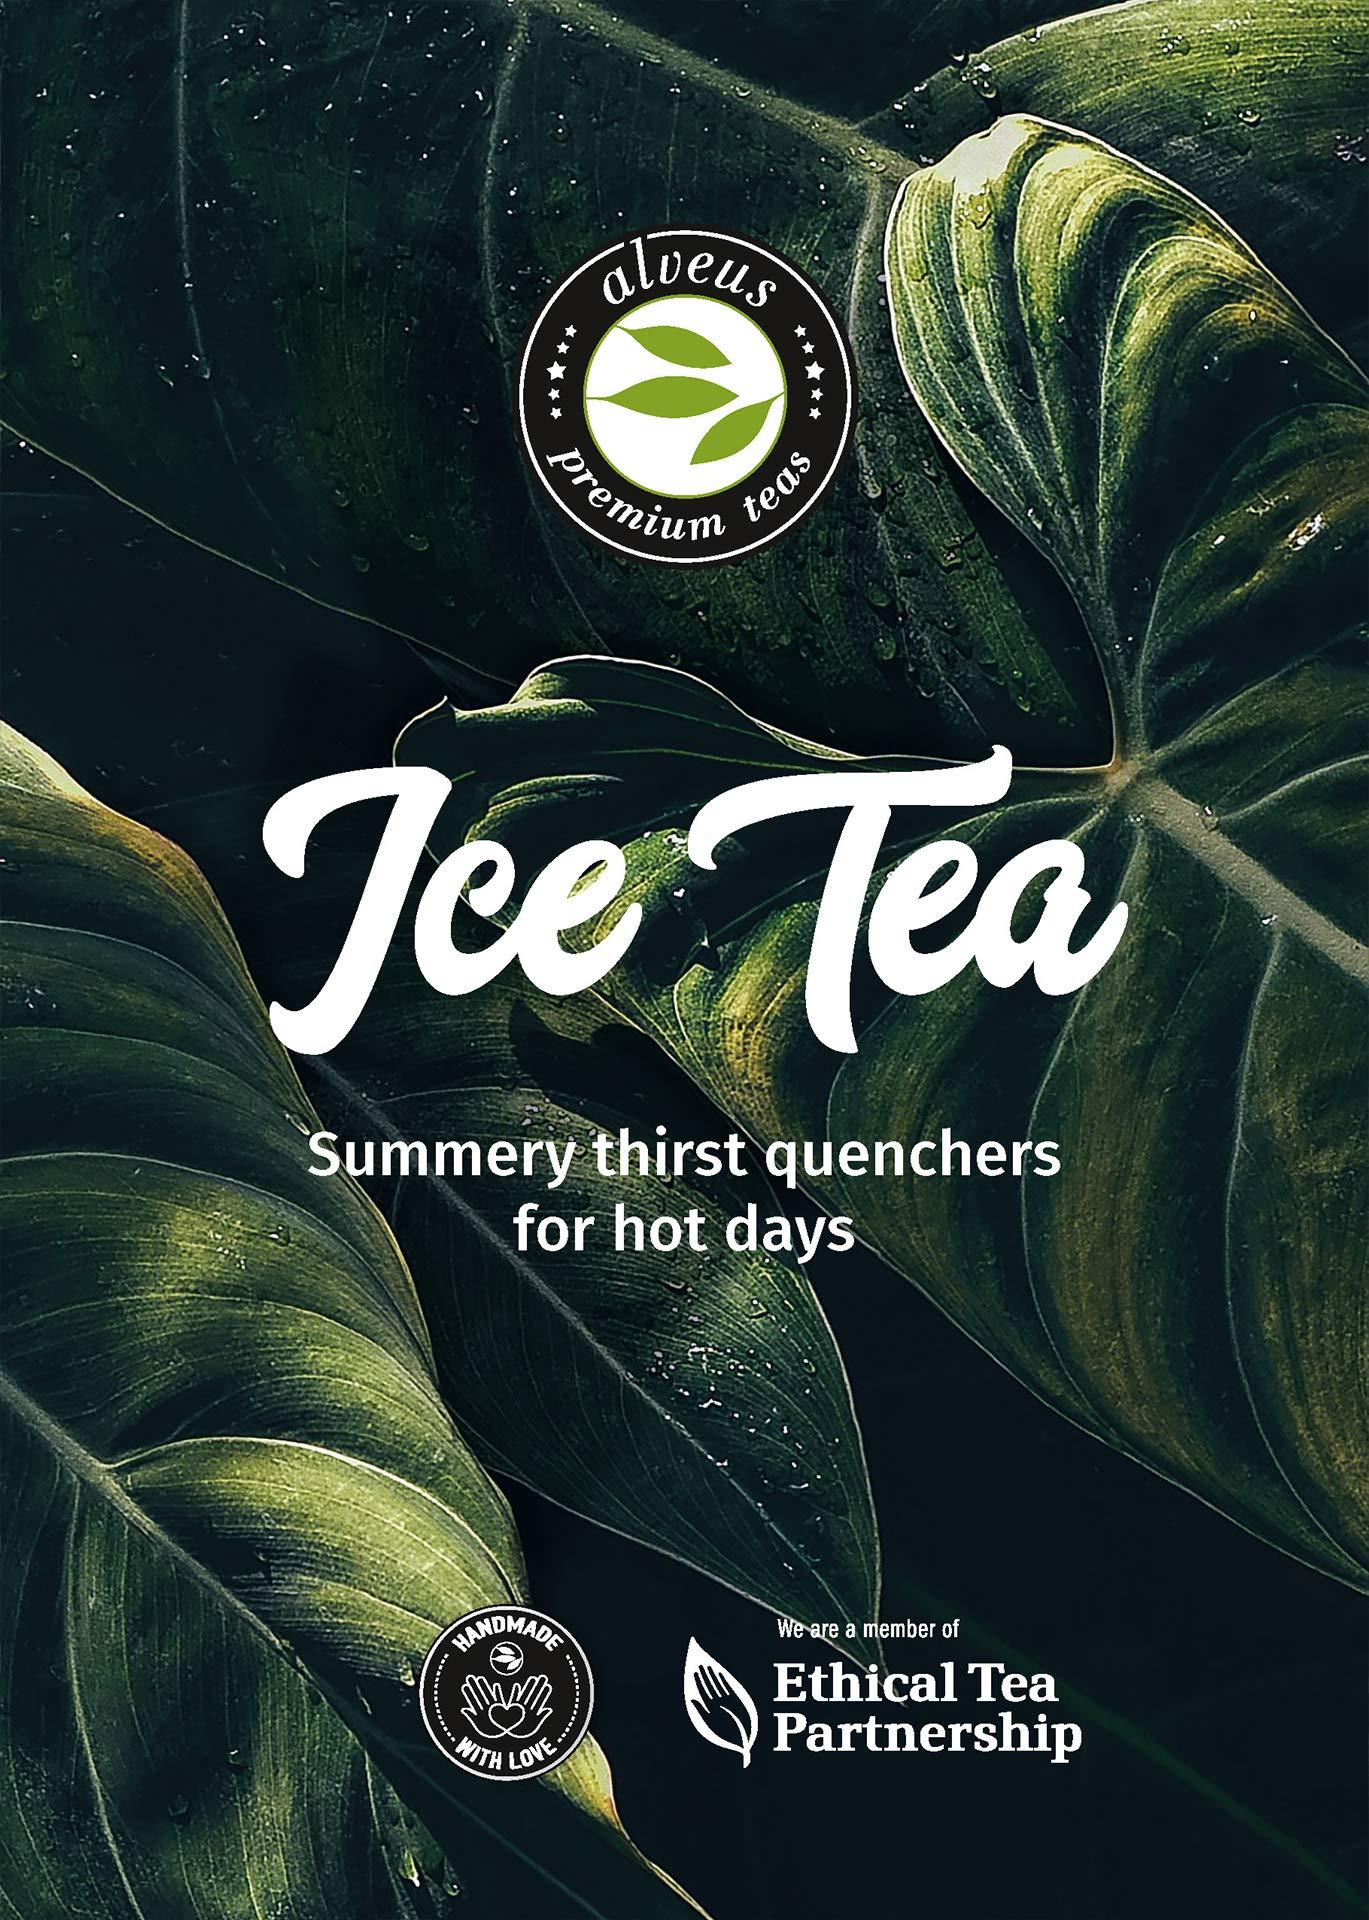 Alveus-White-Ice-Tea-Grapefruit-Cranberry-Taste-100g-Bio-Eistee-Packung